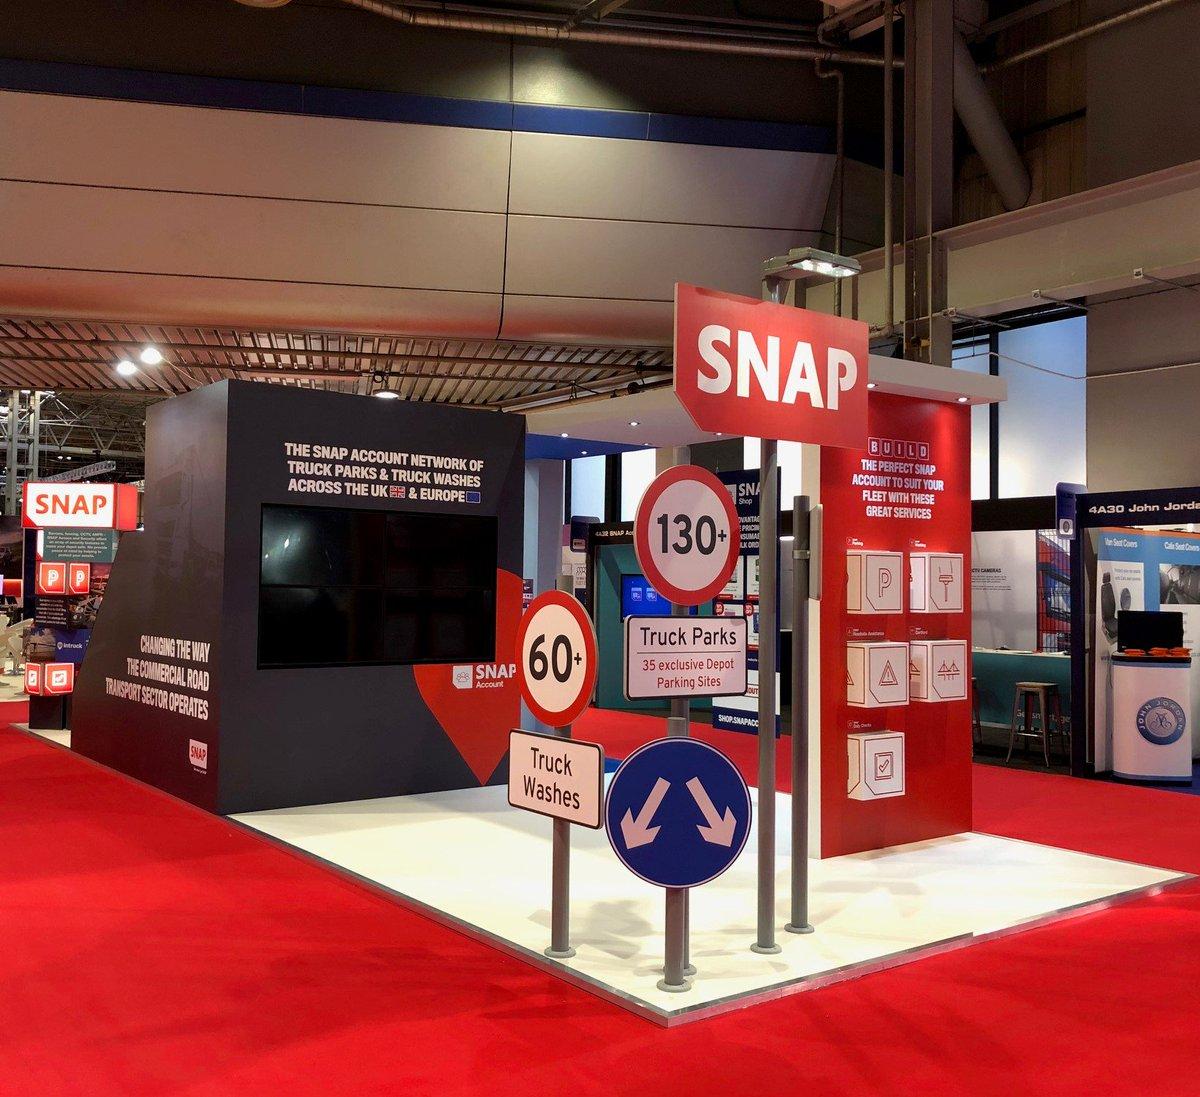 Exhibition Stand Builders Northampton : Aspect exhibitions @aspectexhib twitter